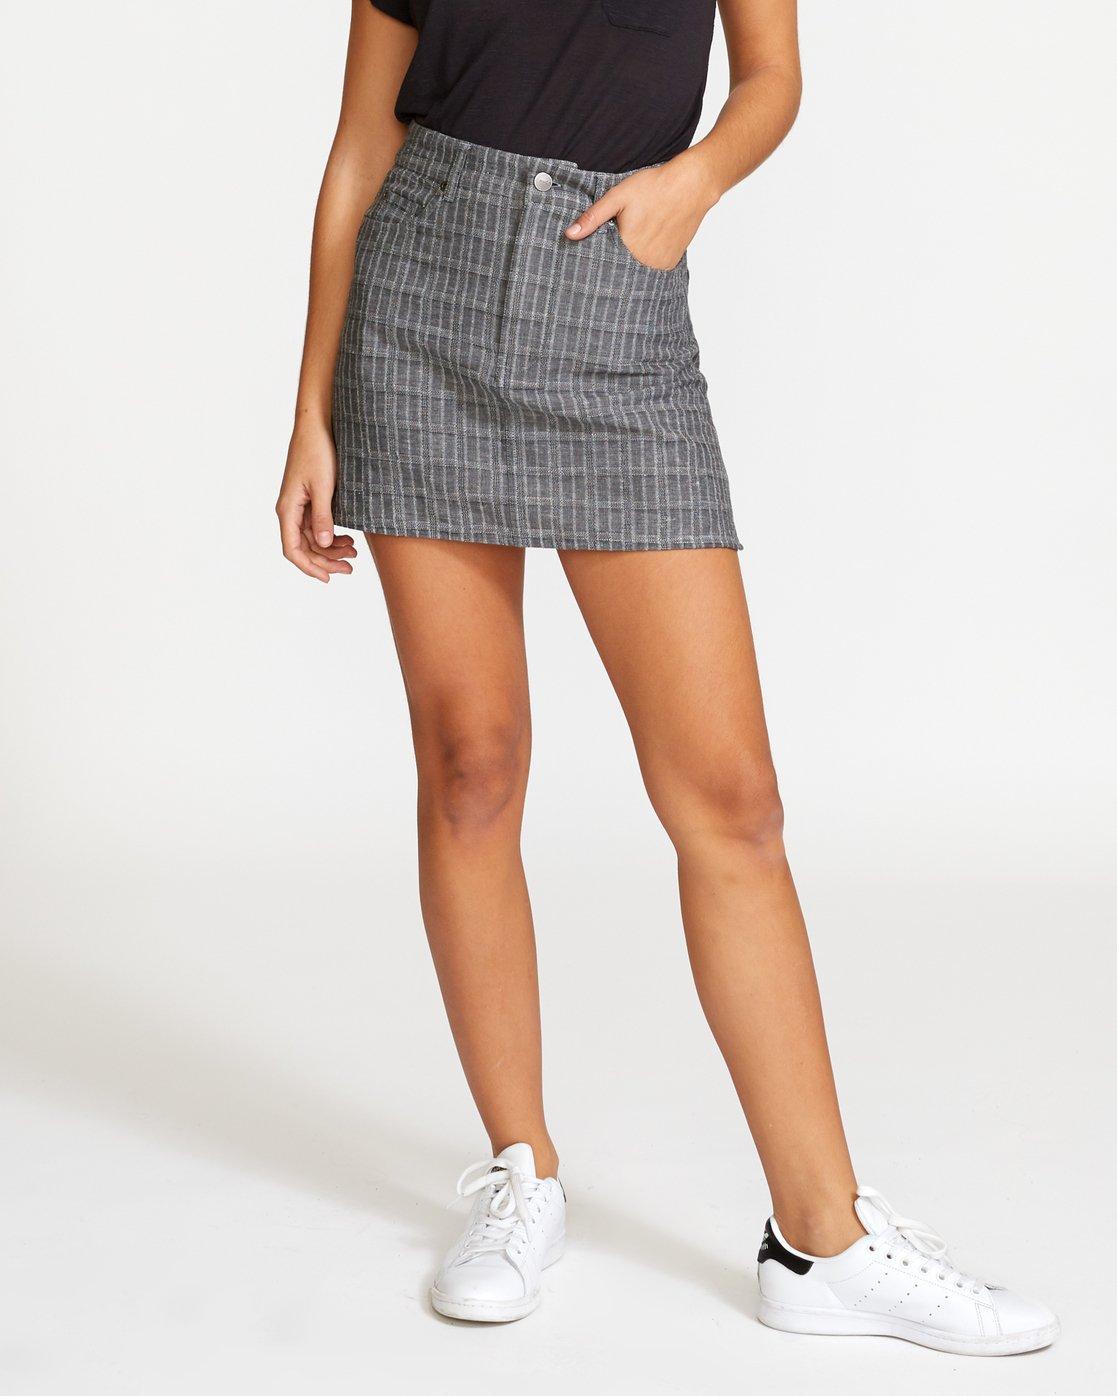 0 Rowdy Plaid  - Jeans-Minirock für Frauen  Q3SKRDRVF9 RVCA